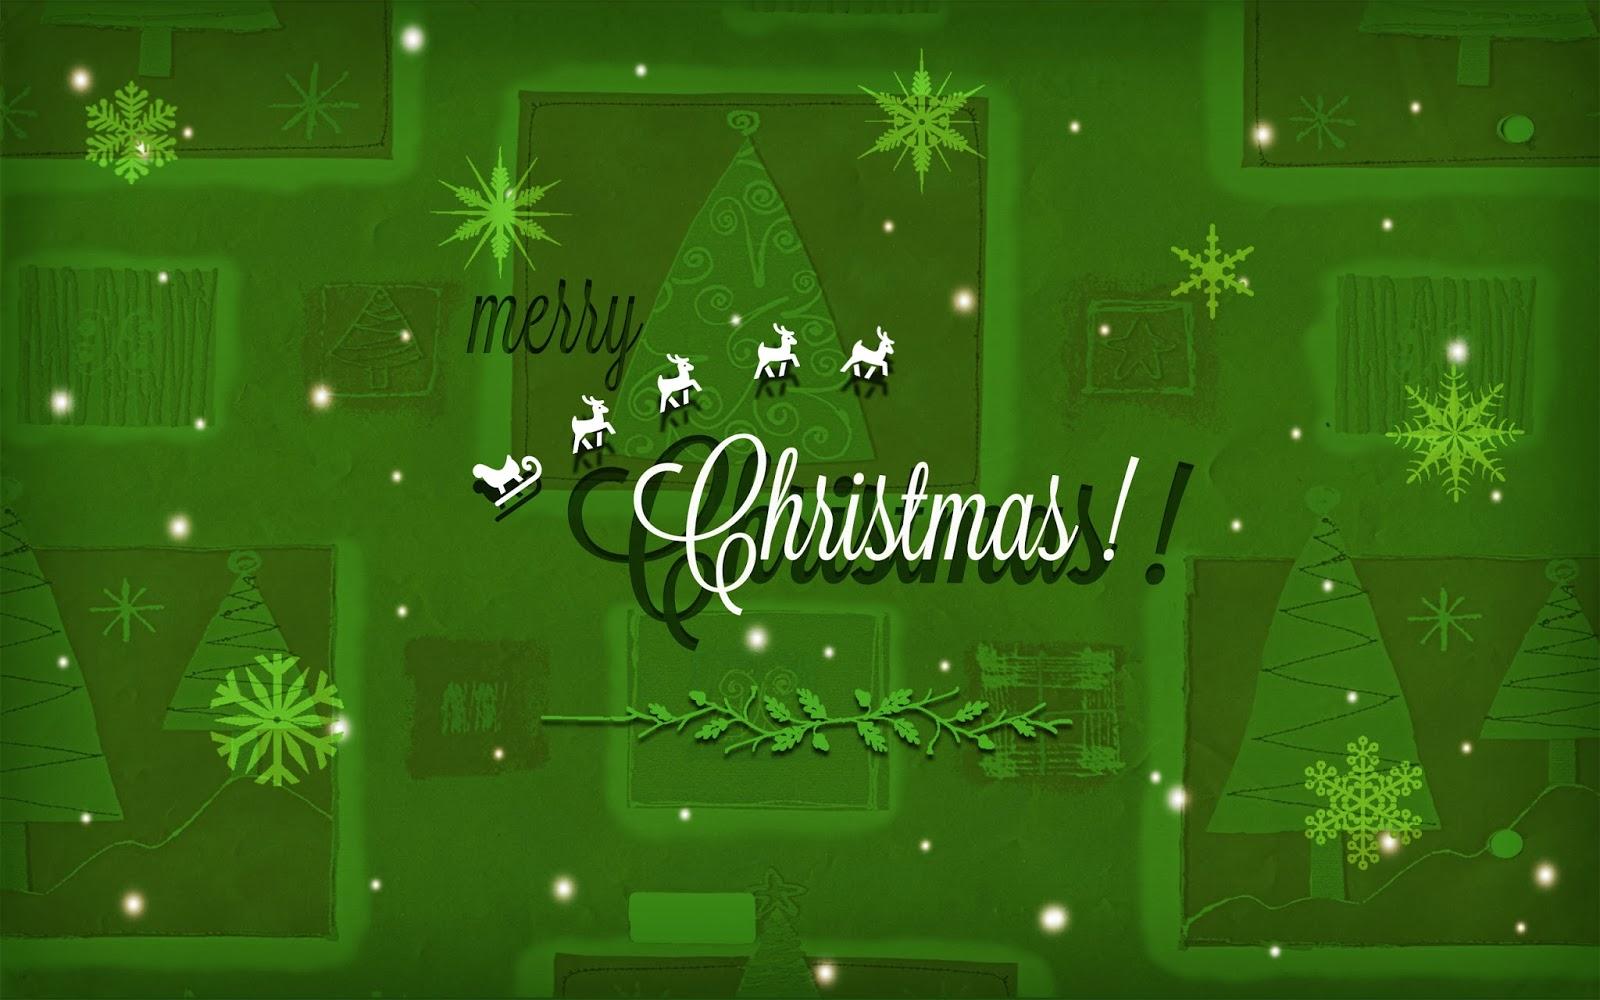 Christmas Wallpaper Widescreen Hd Wallpapers9 1600x1000